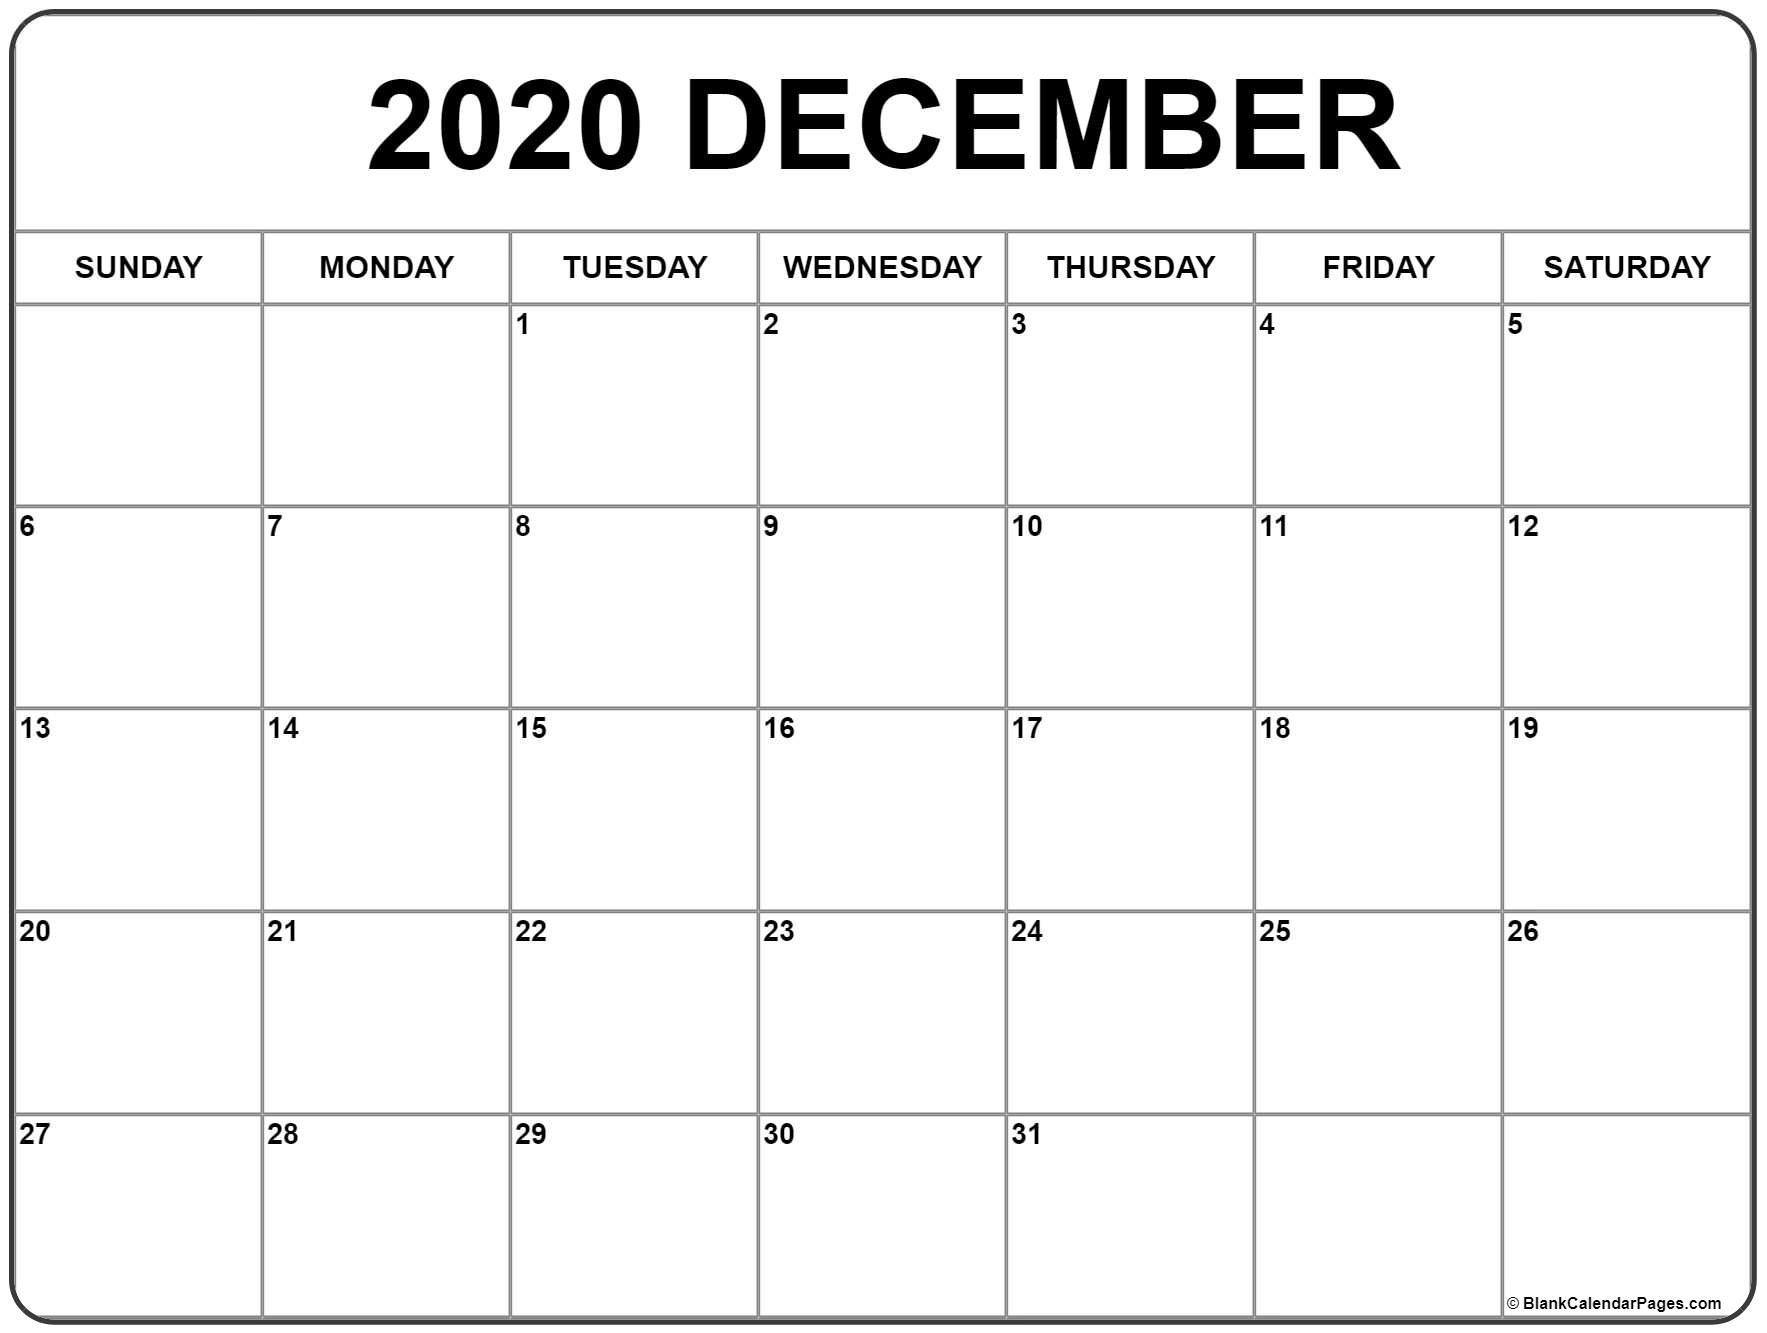 December 2020 Printable Calendar Template #2020Calendars-Fill In Calendar Template 2020